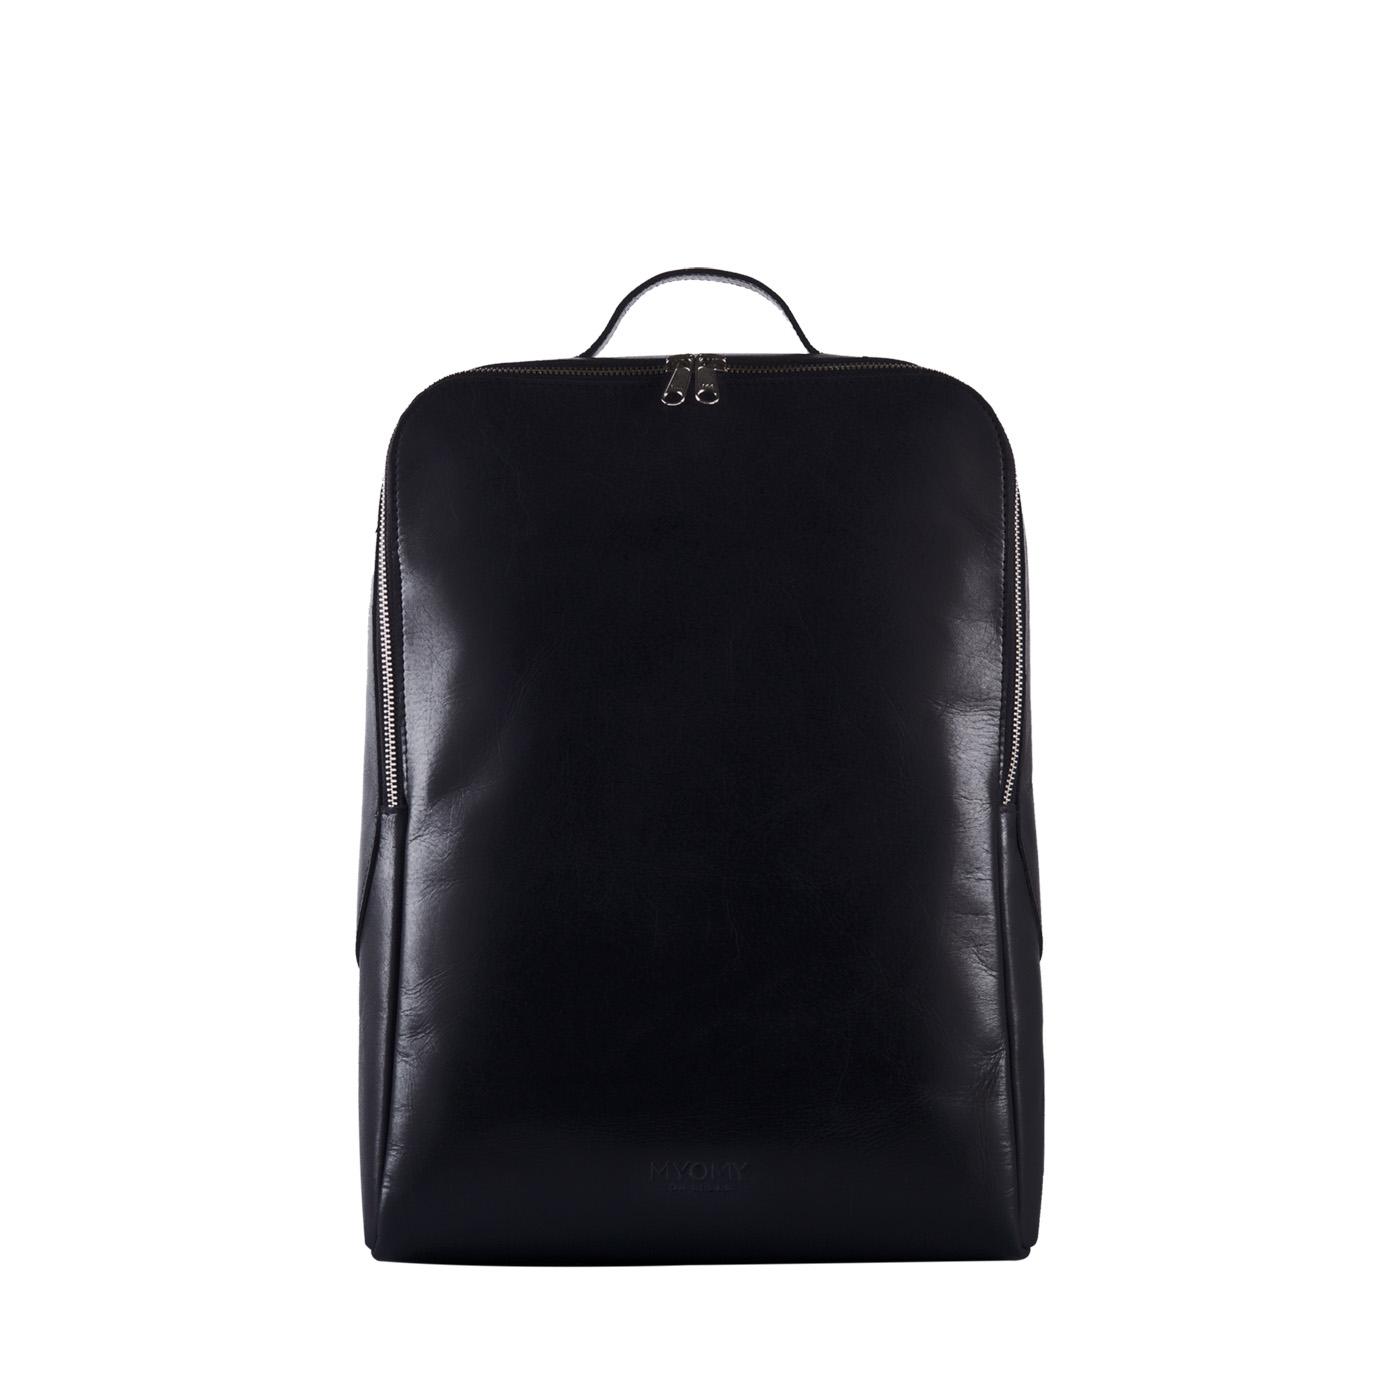 MY GYM BAG Back Bag laptop - hunter waxy black